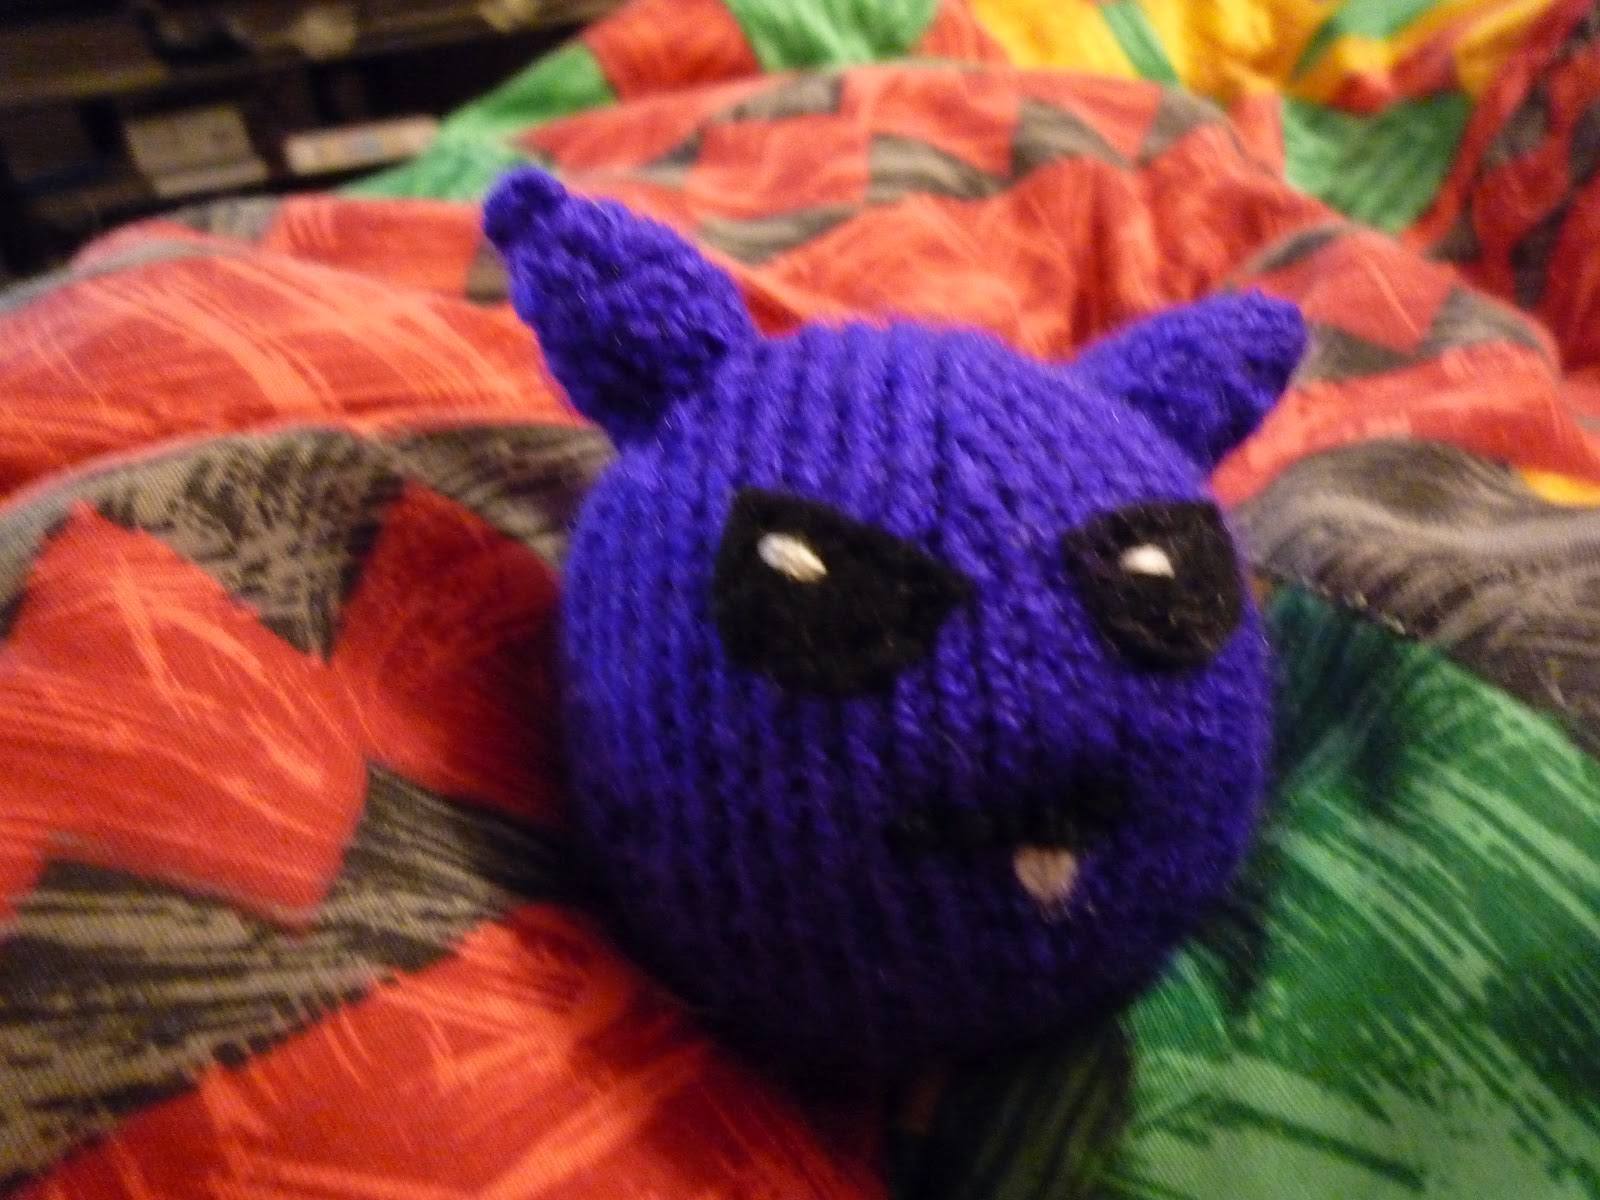 Abbreviation Kfb In Knitting : Marmokachi s kiimon